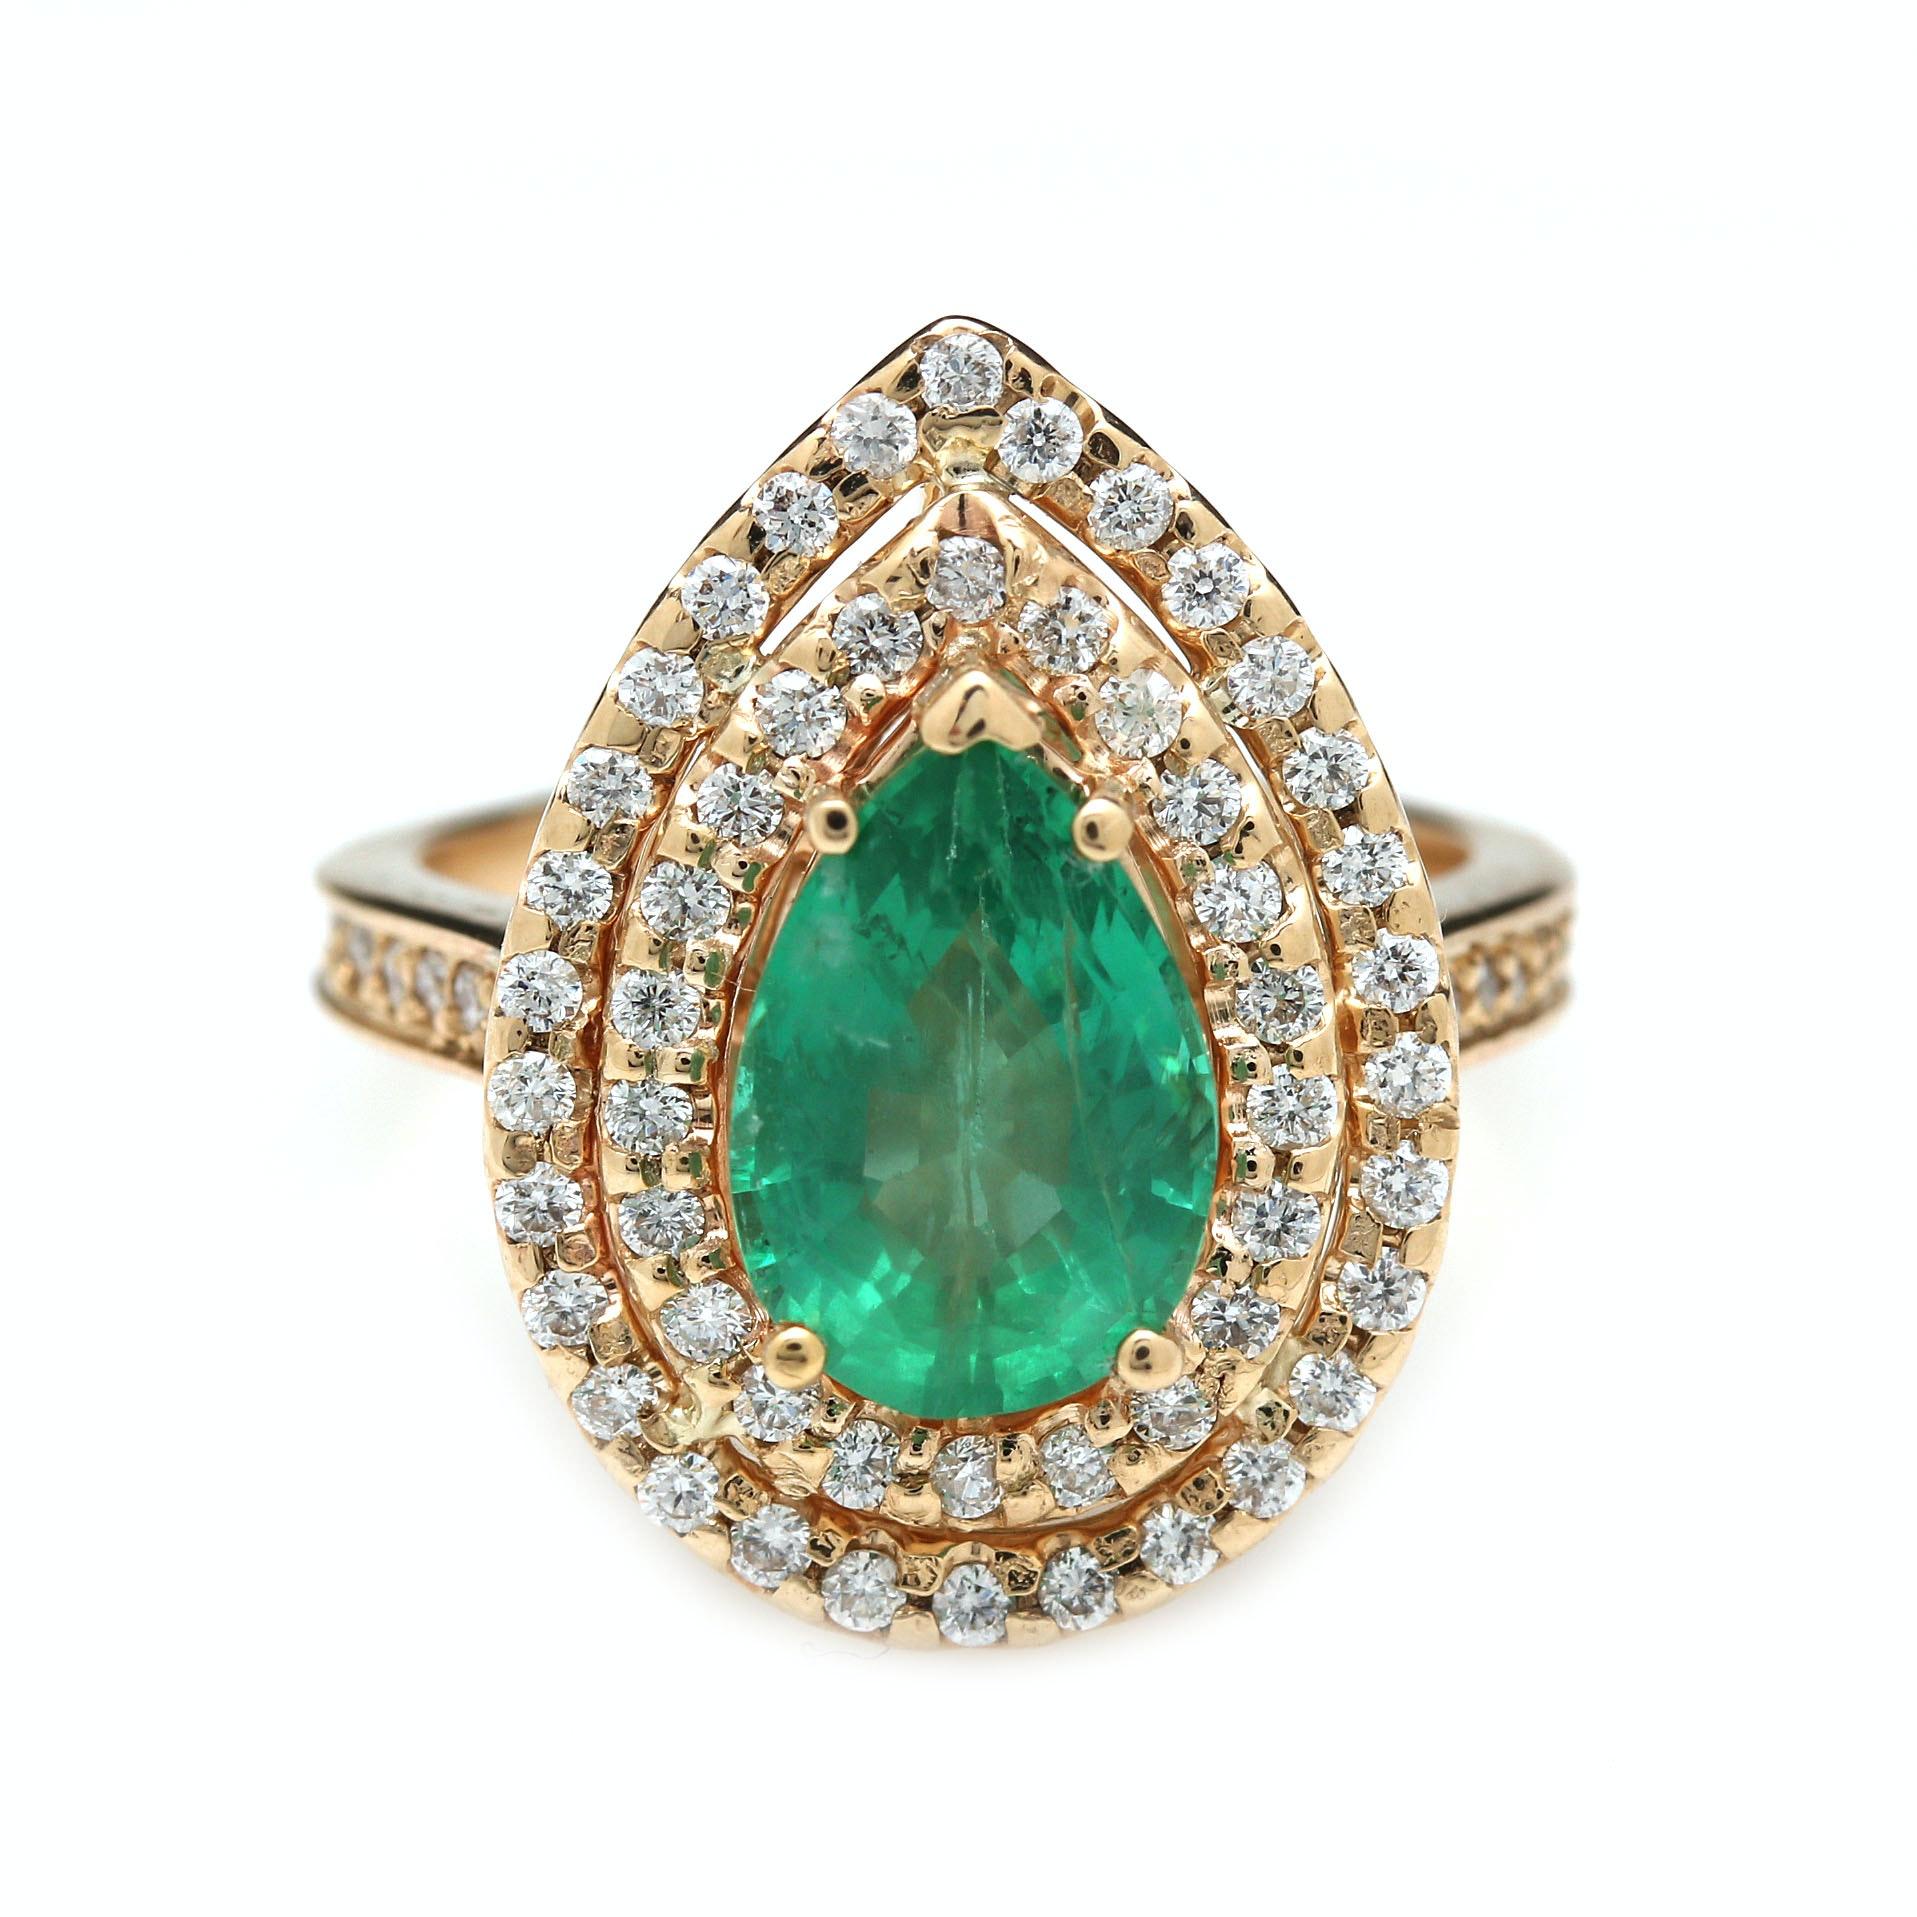 14K Yellow Gold 1.90 CT Emerald and Diamond Ring